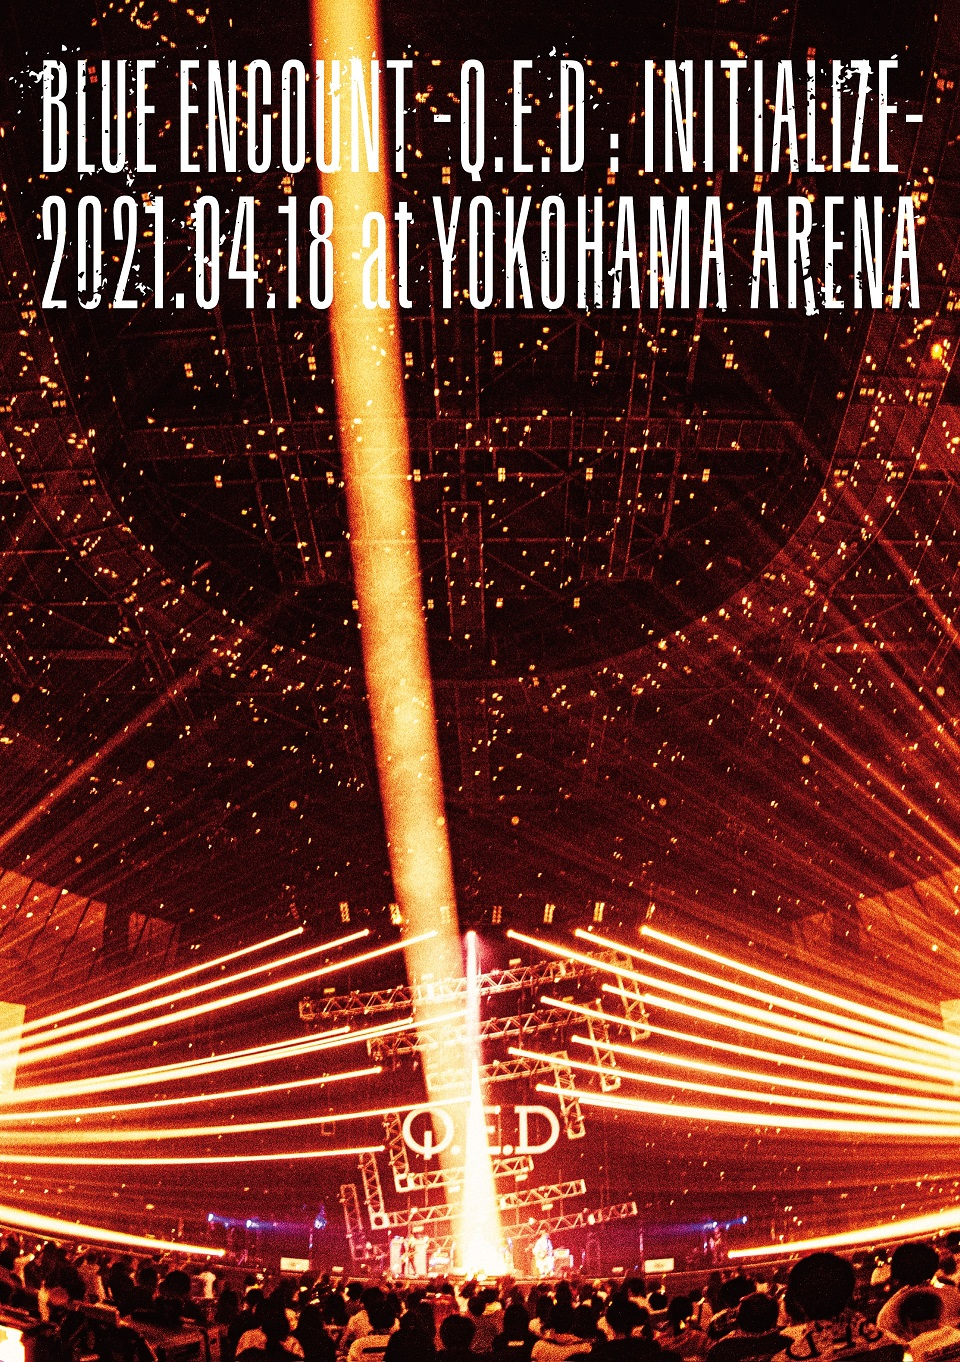 「BLUE ENCOUNT ~Q.E.D : INITIALIZE~」2021.04.18 at YOKOHAMA ARENA